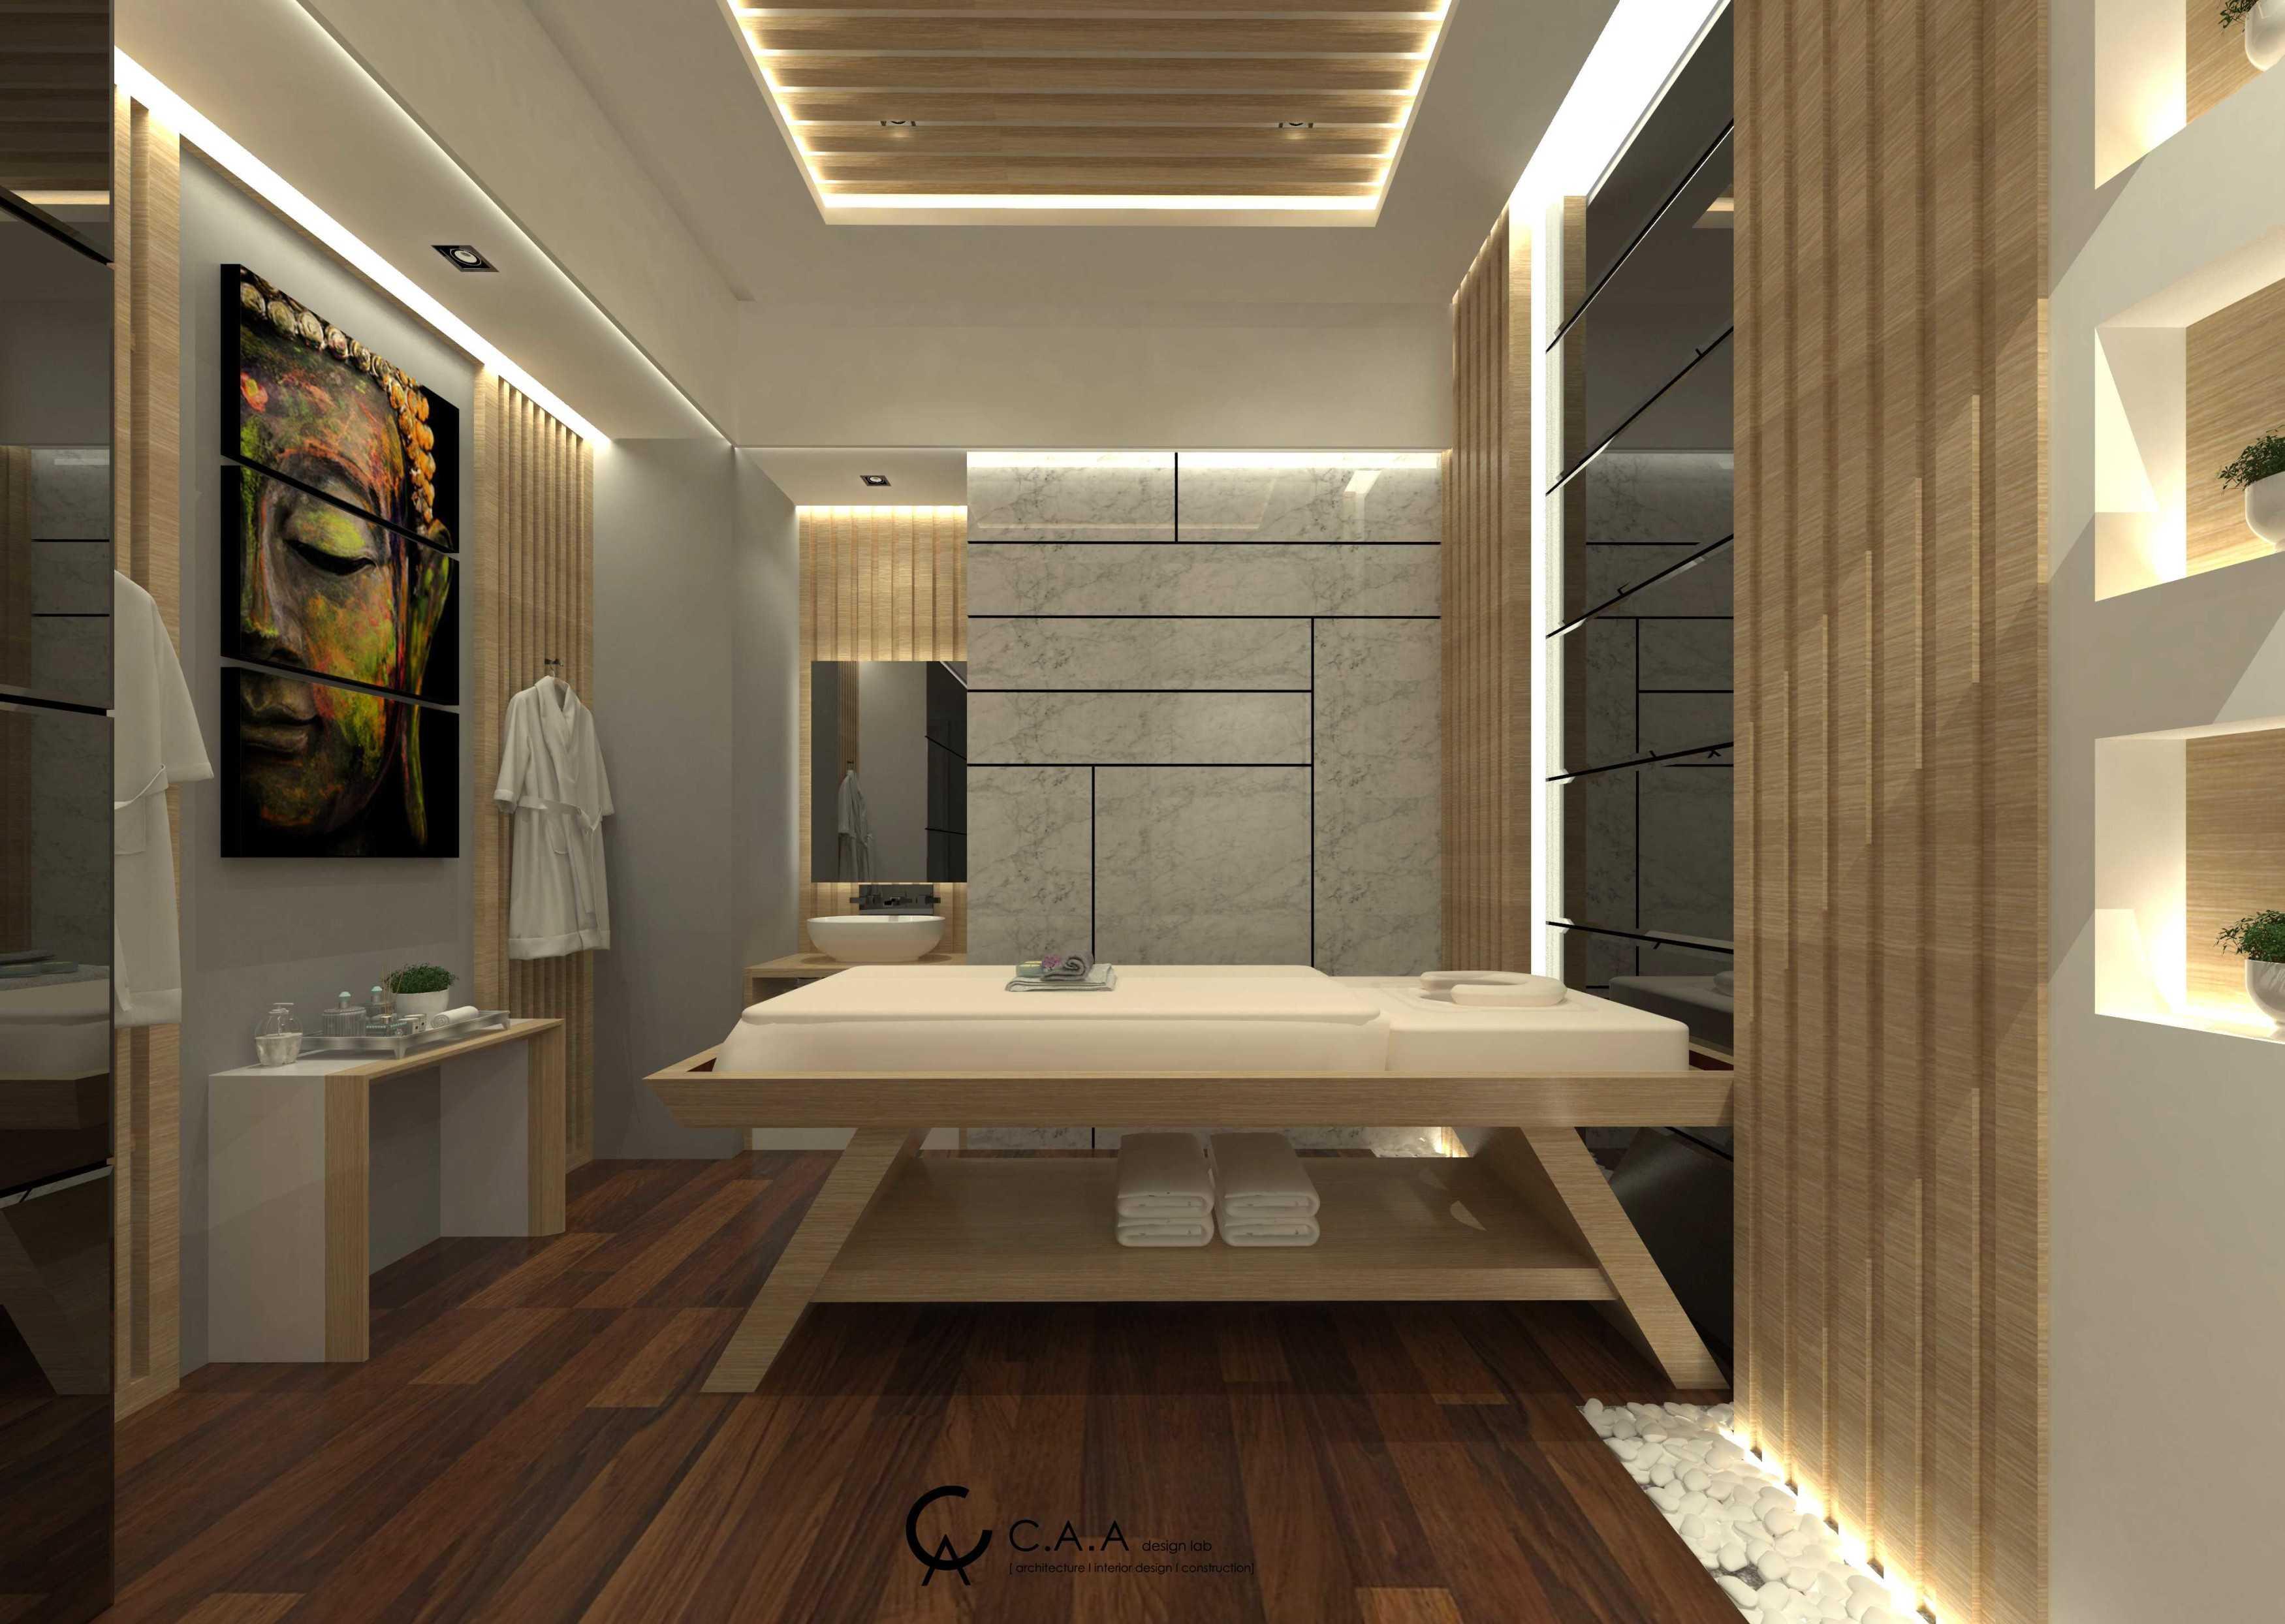 Ada Design Studio Four Point - Thamrin Jalan M.h. Thamrin Kav. 9 Jakarta Id-Jk, Gondangdia, Menteng, Kota Jakarta Pusat, Daerah Khusus Ibukota Jakarta 10350, Indonesia Jalan M.h. Thamrin Kav. 9 Jakarta Id-Jk, Gondangdia, Menteng, Kota Jakarta Pusat, Daerah Khusus Ibukota Jakarta 10350, Indonesia Ada-Design-Lab-Four-Point-Thamrin   67489